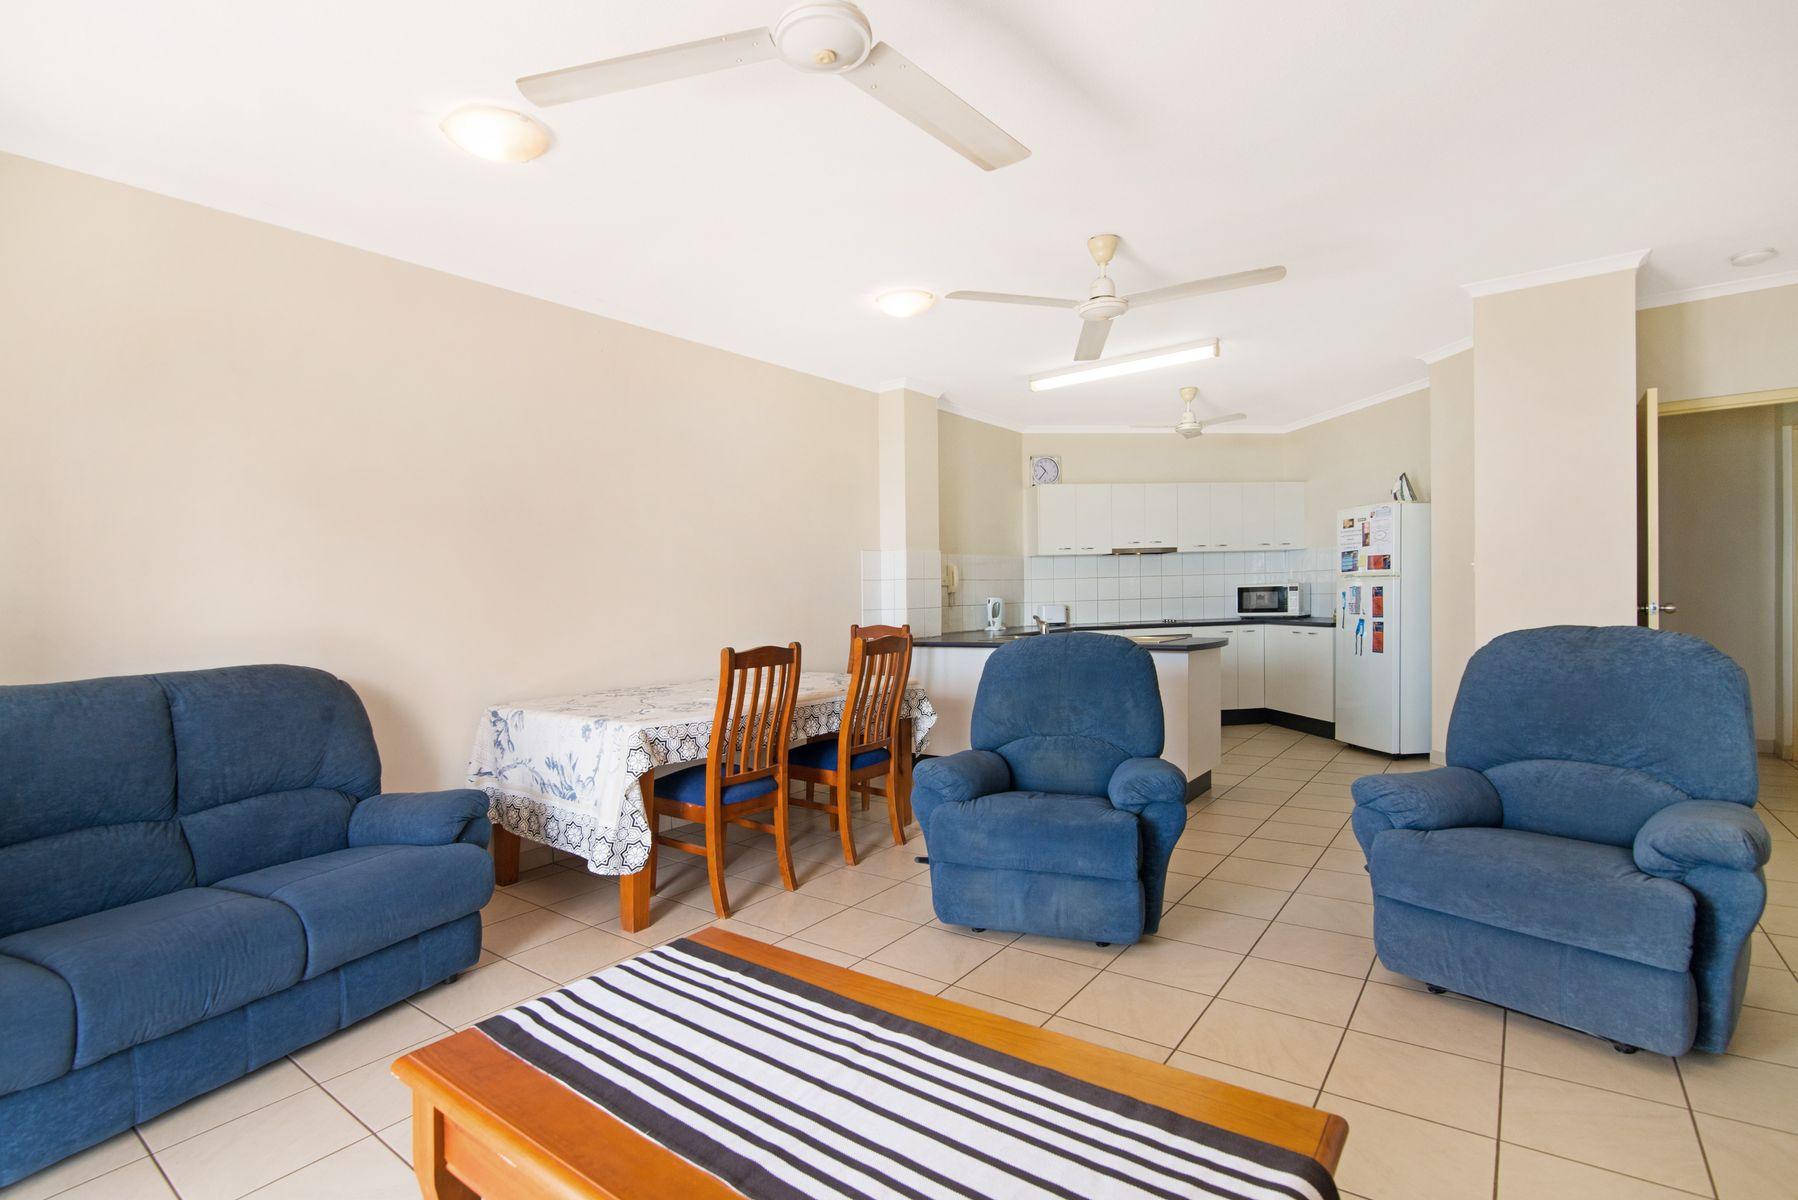 29/3 Cardona Court, Darwin City, NT 0800